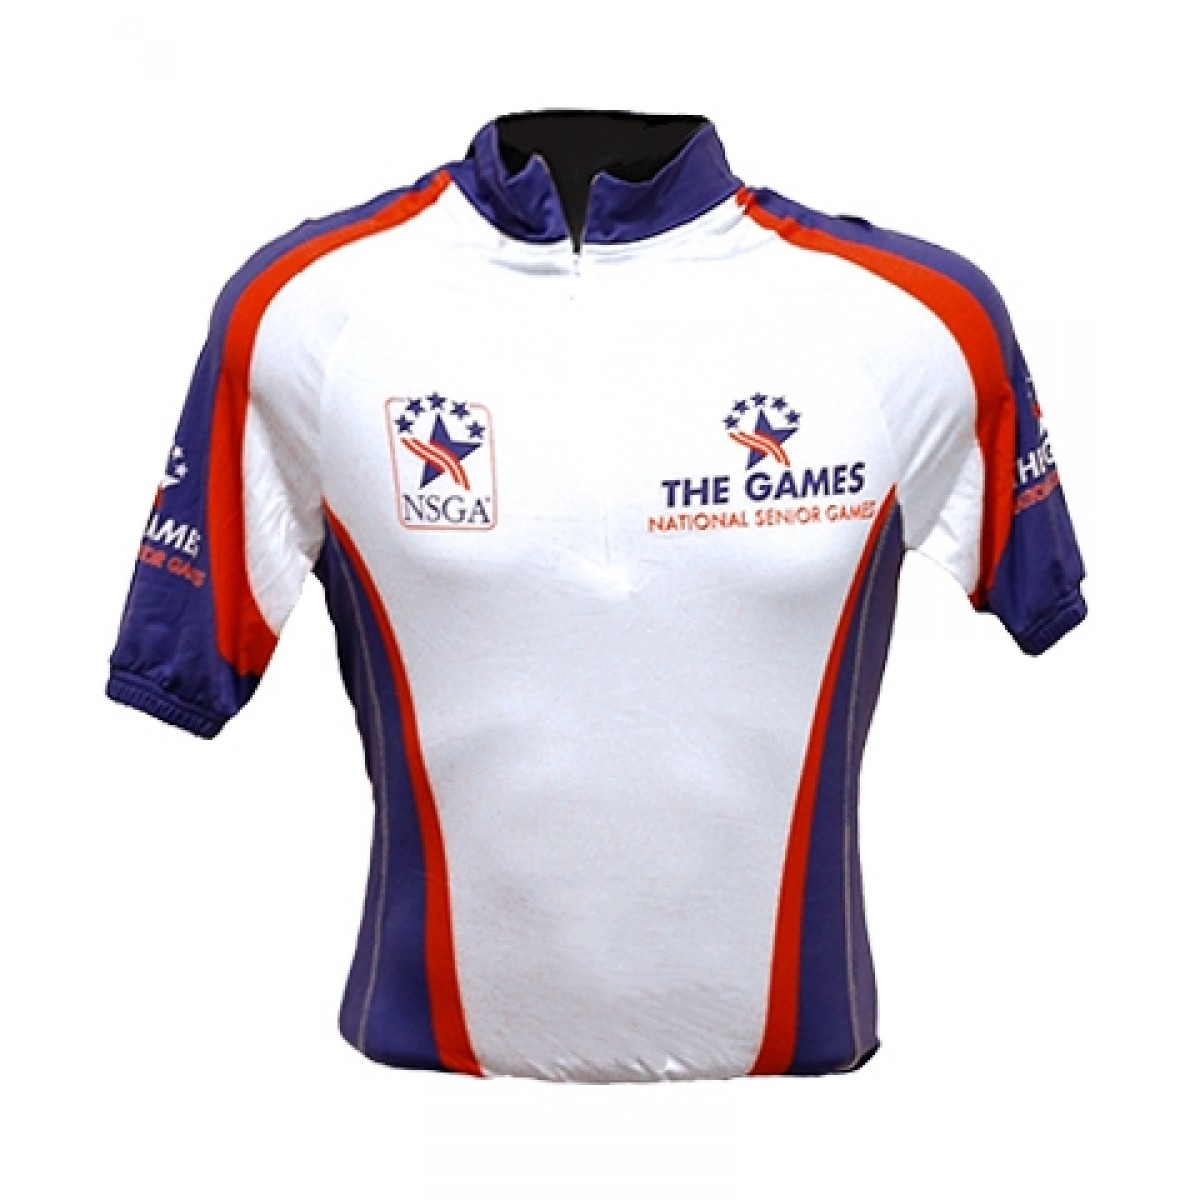 Senior Games Cycling Jersey